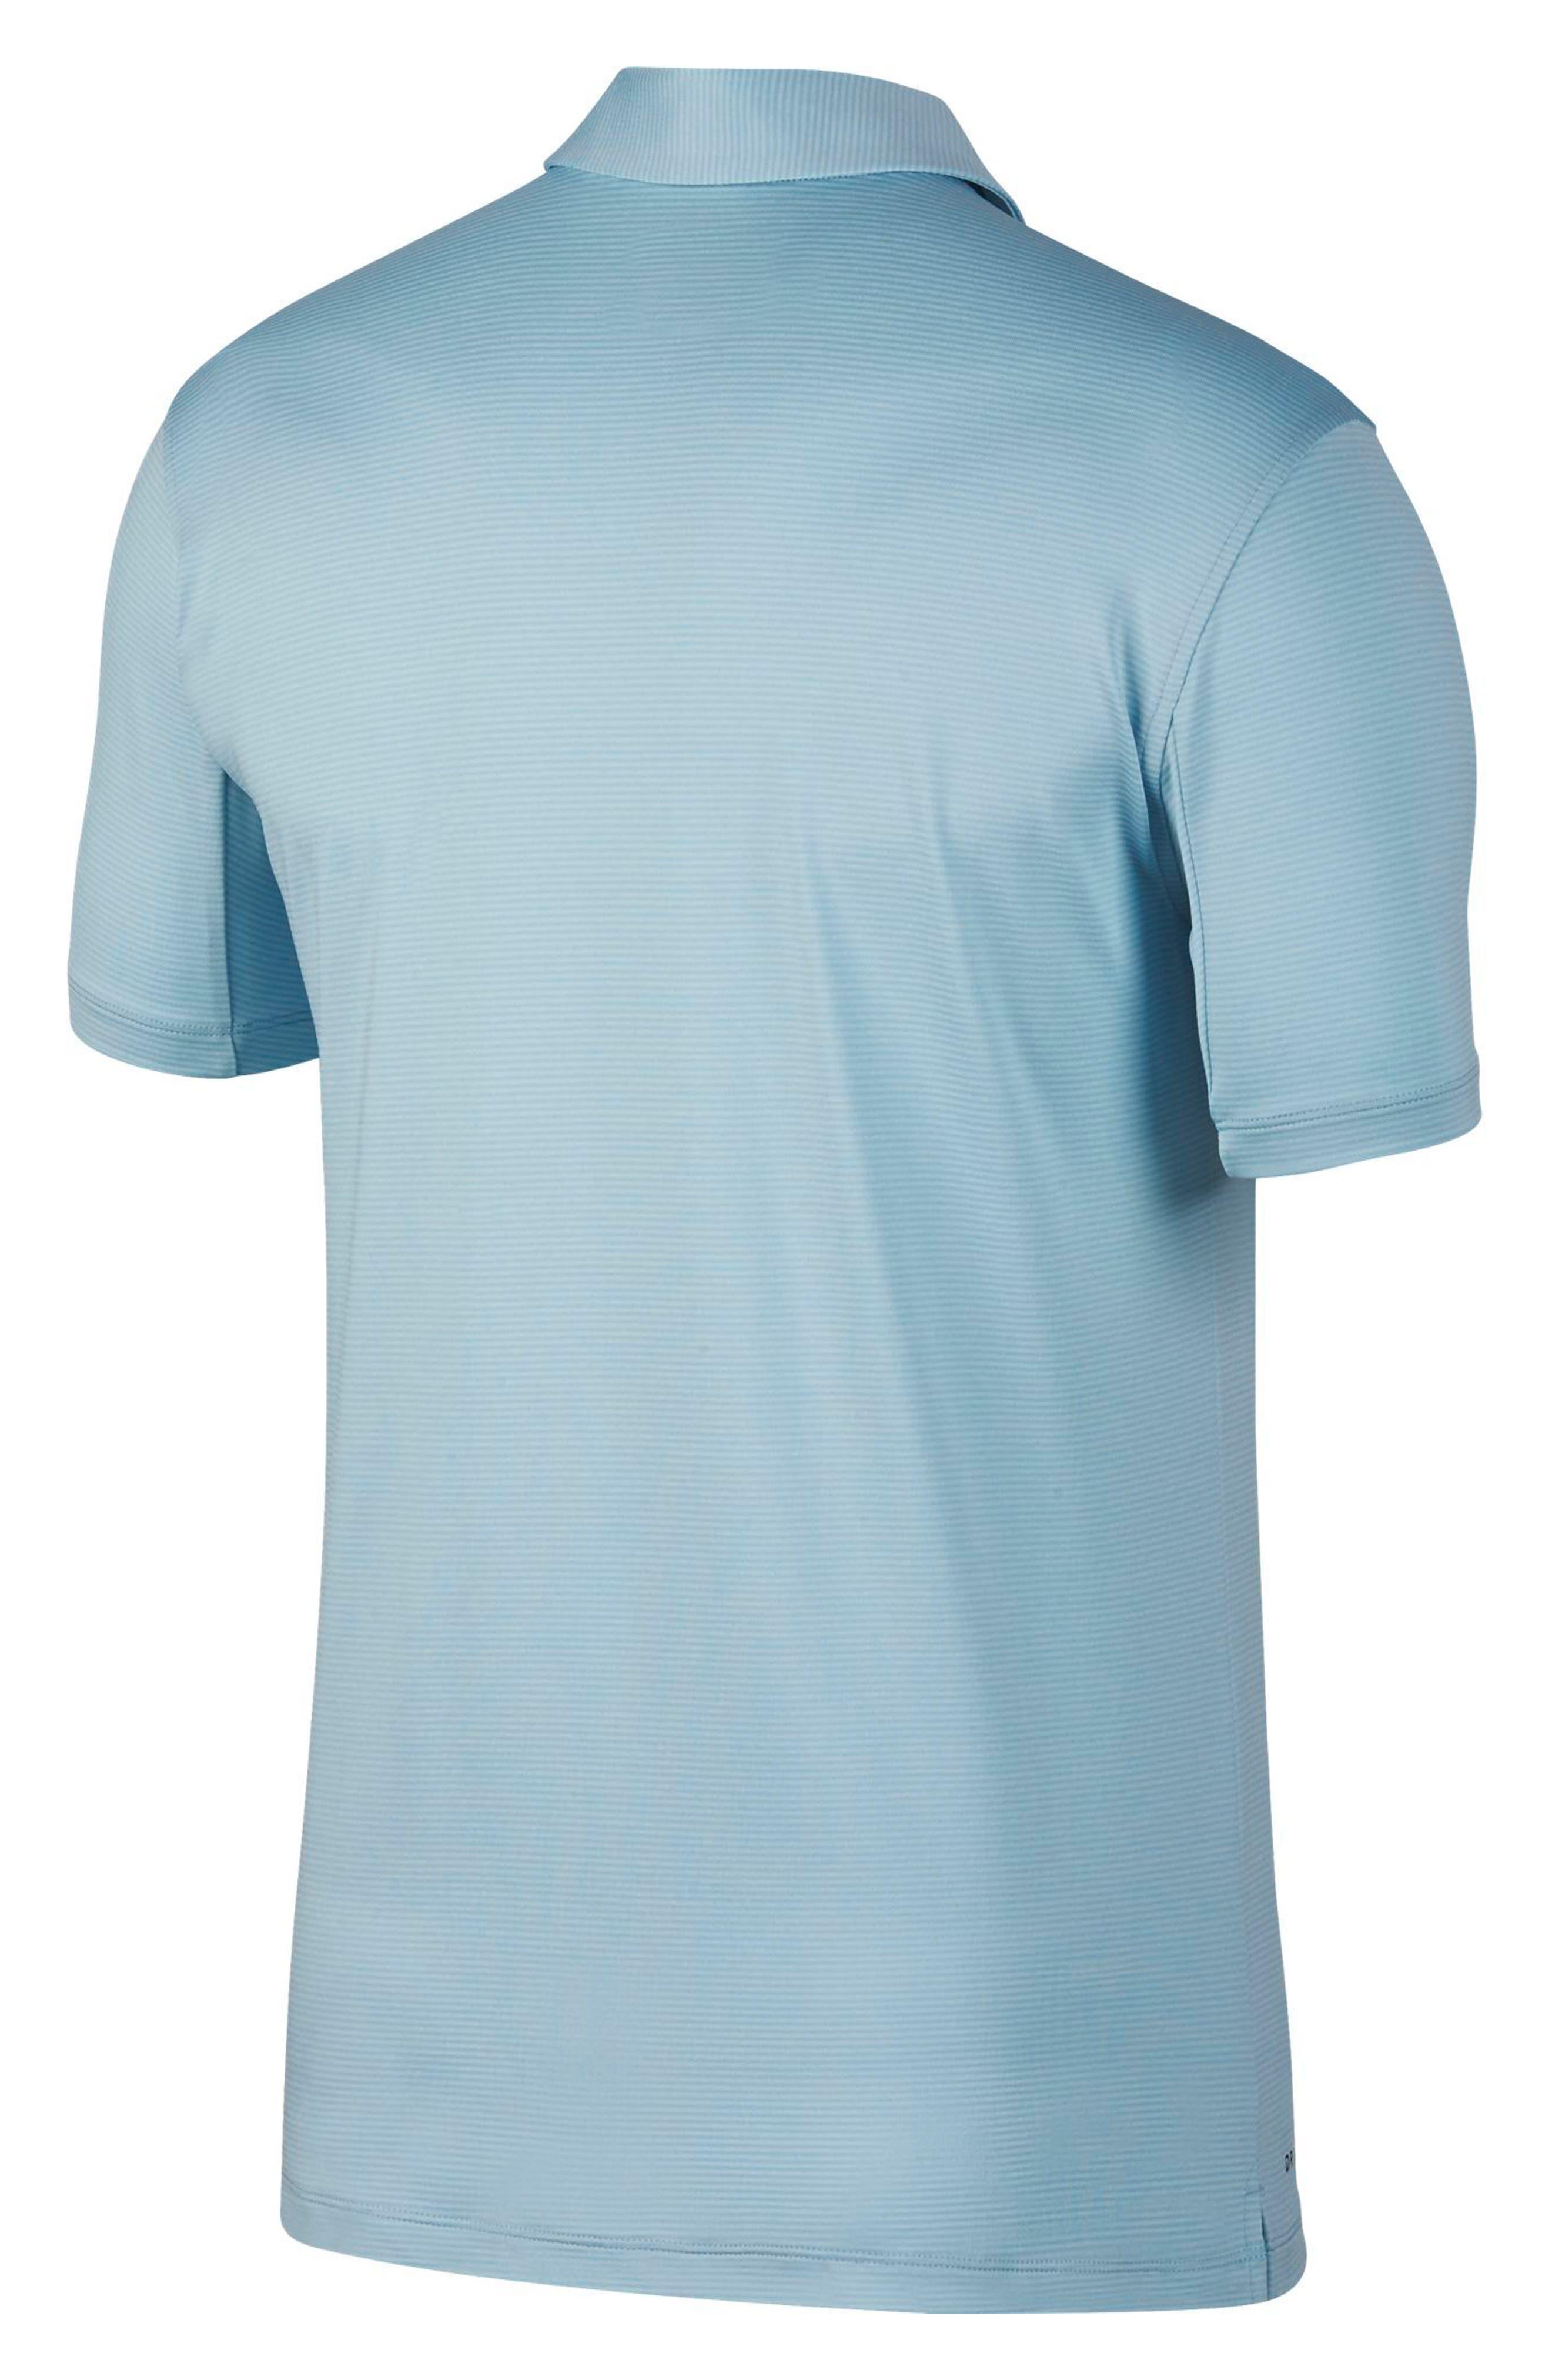 Dry Polo Shirt,                             Alternate thumbnail 7, color,                             OCEAN BLISS/ SILVER